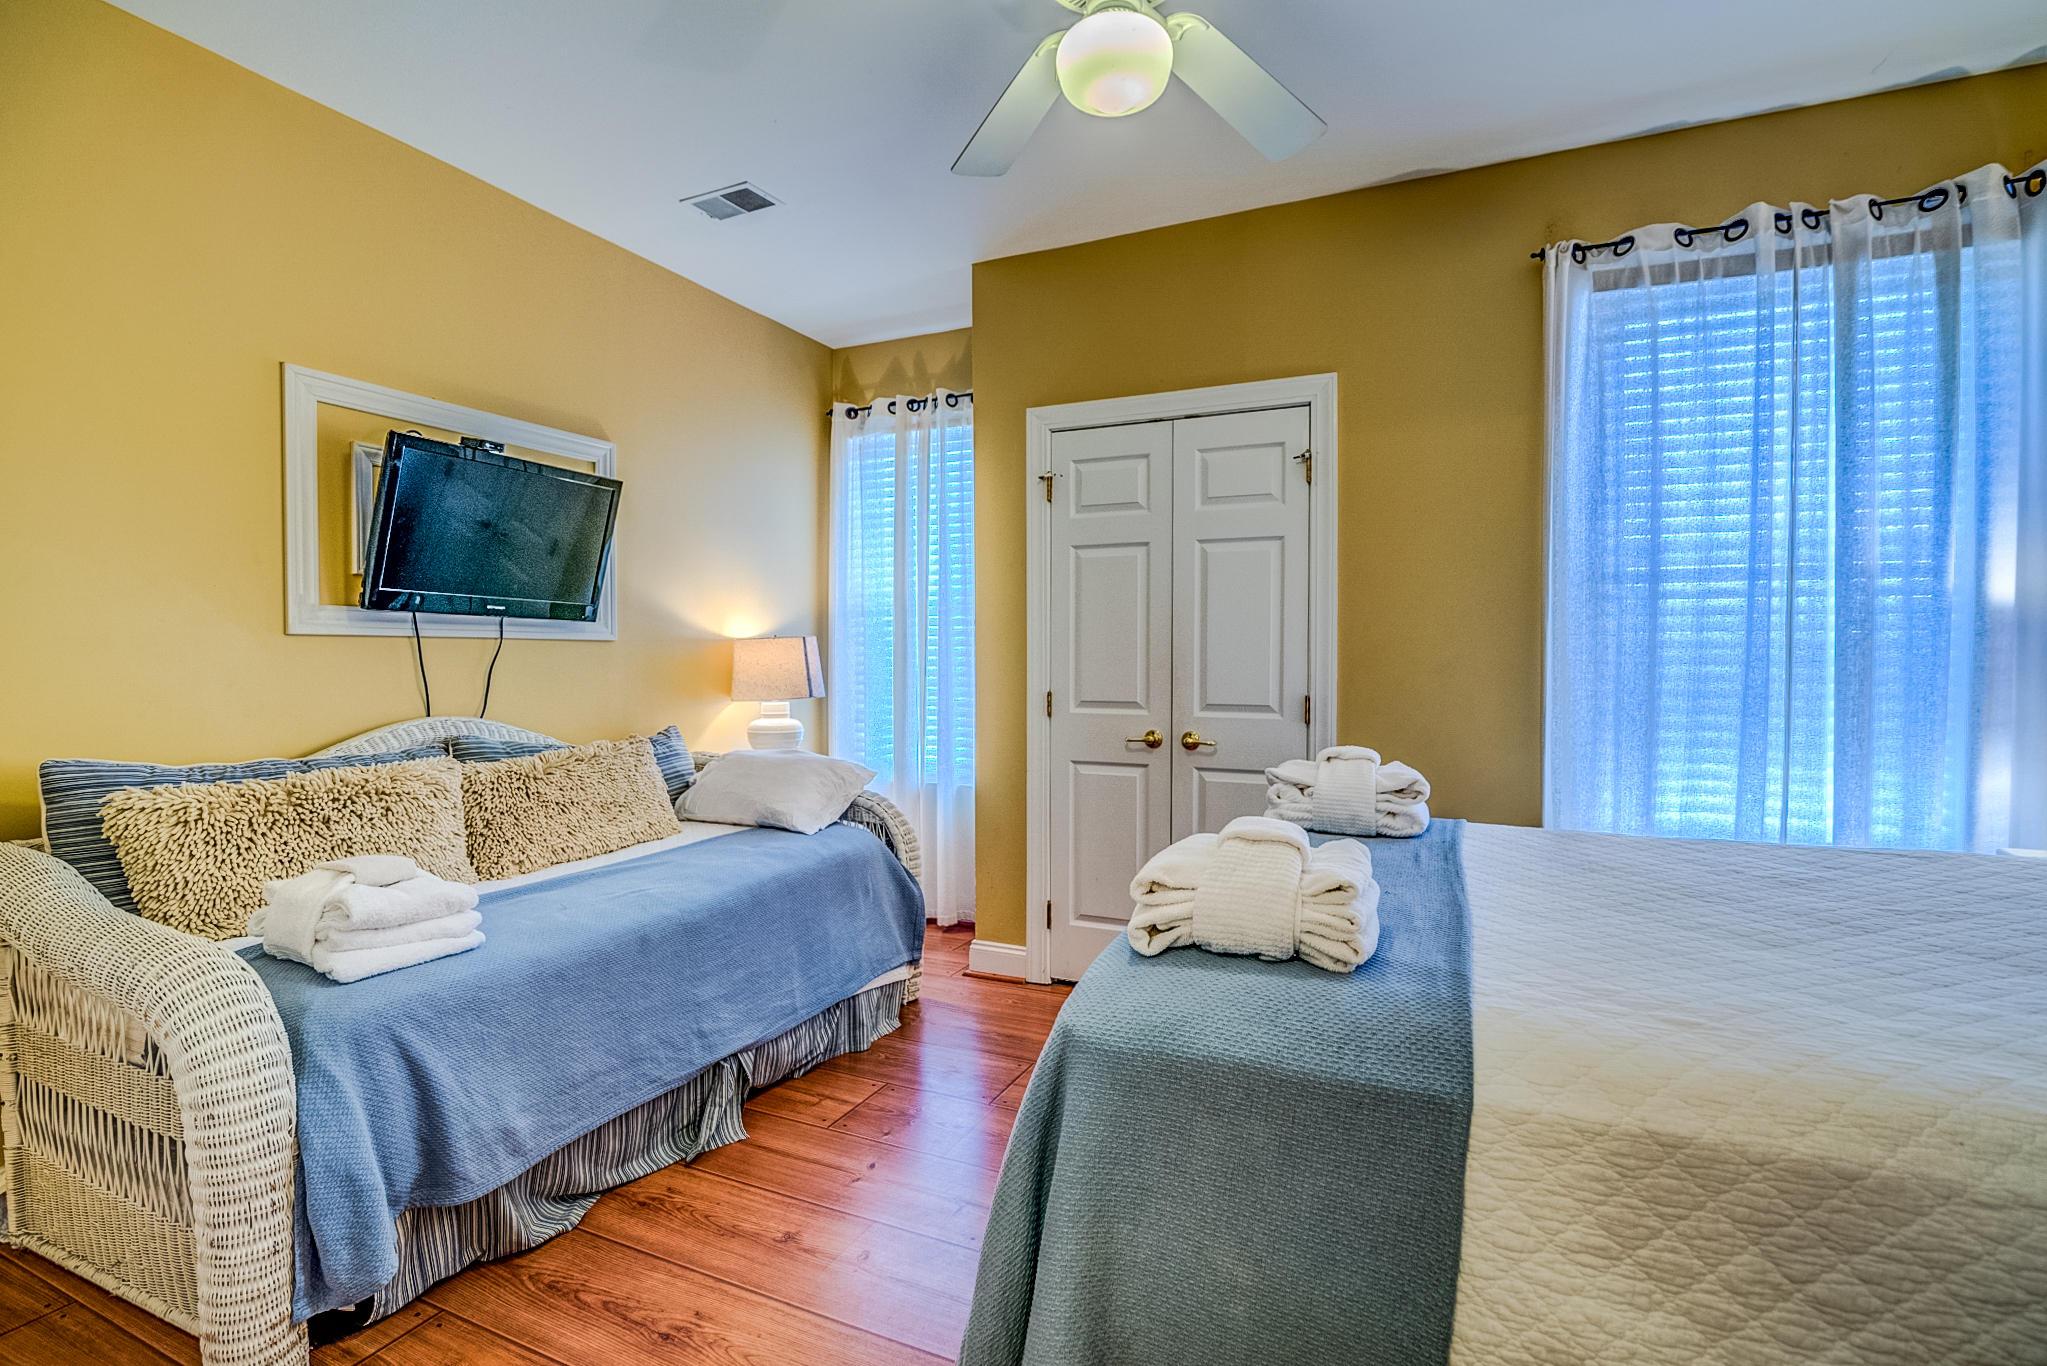 Ocean Pointe Villas Homes For Sale - 214 Arctic, Folly Beach, SC - 7